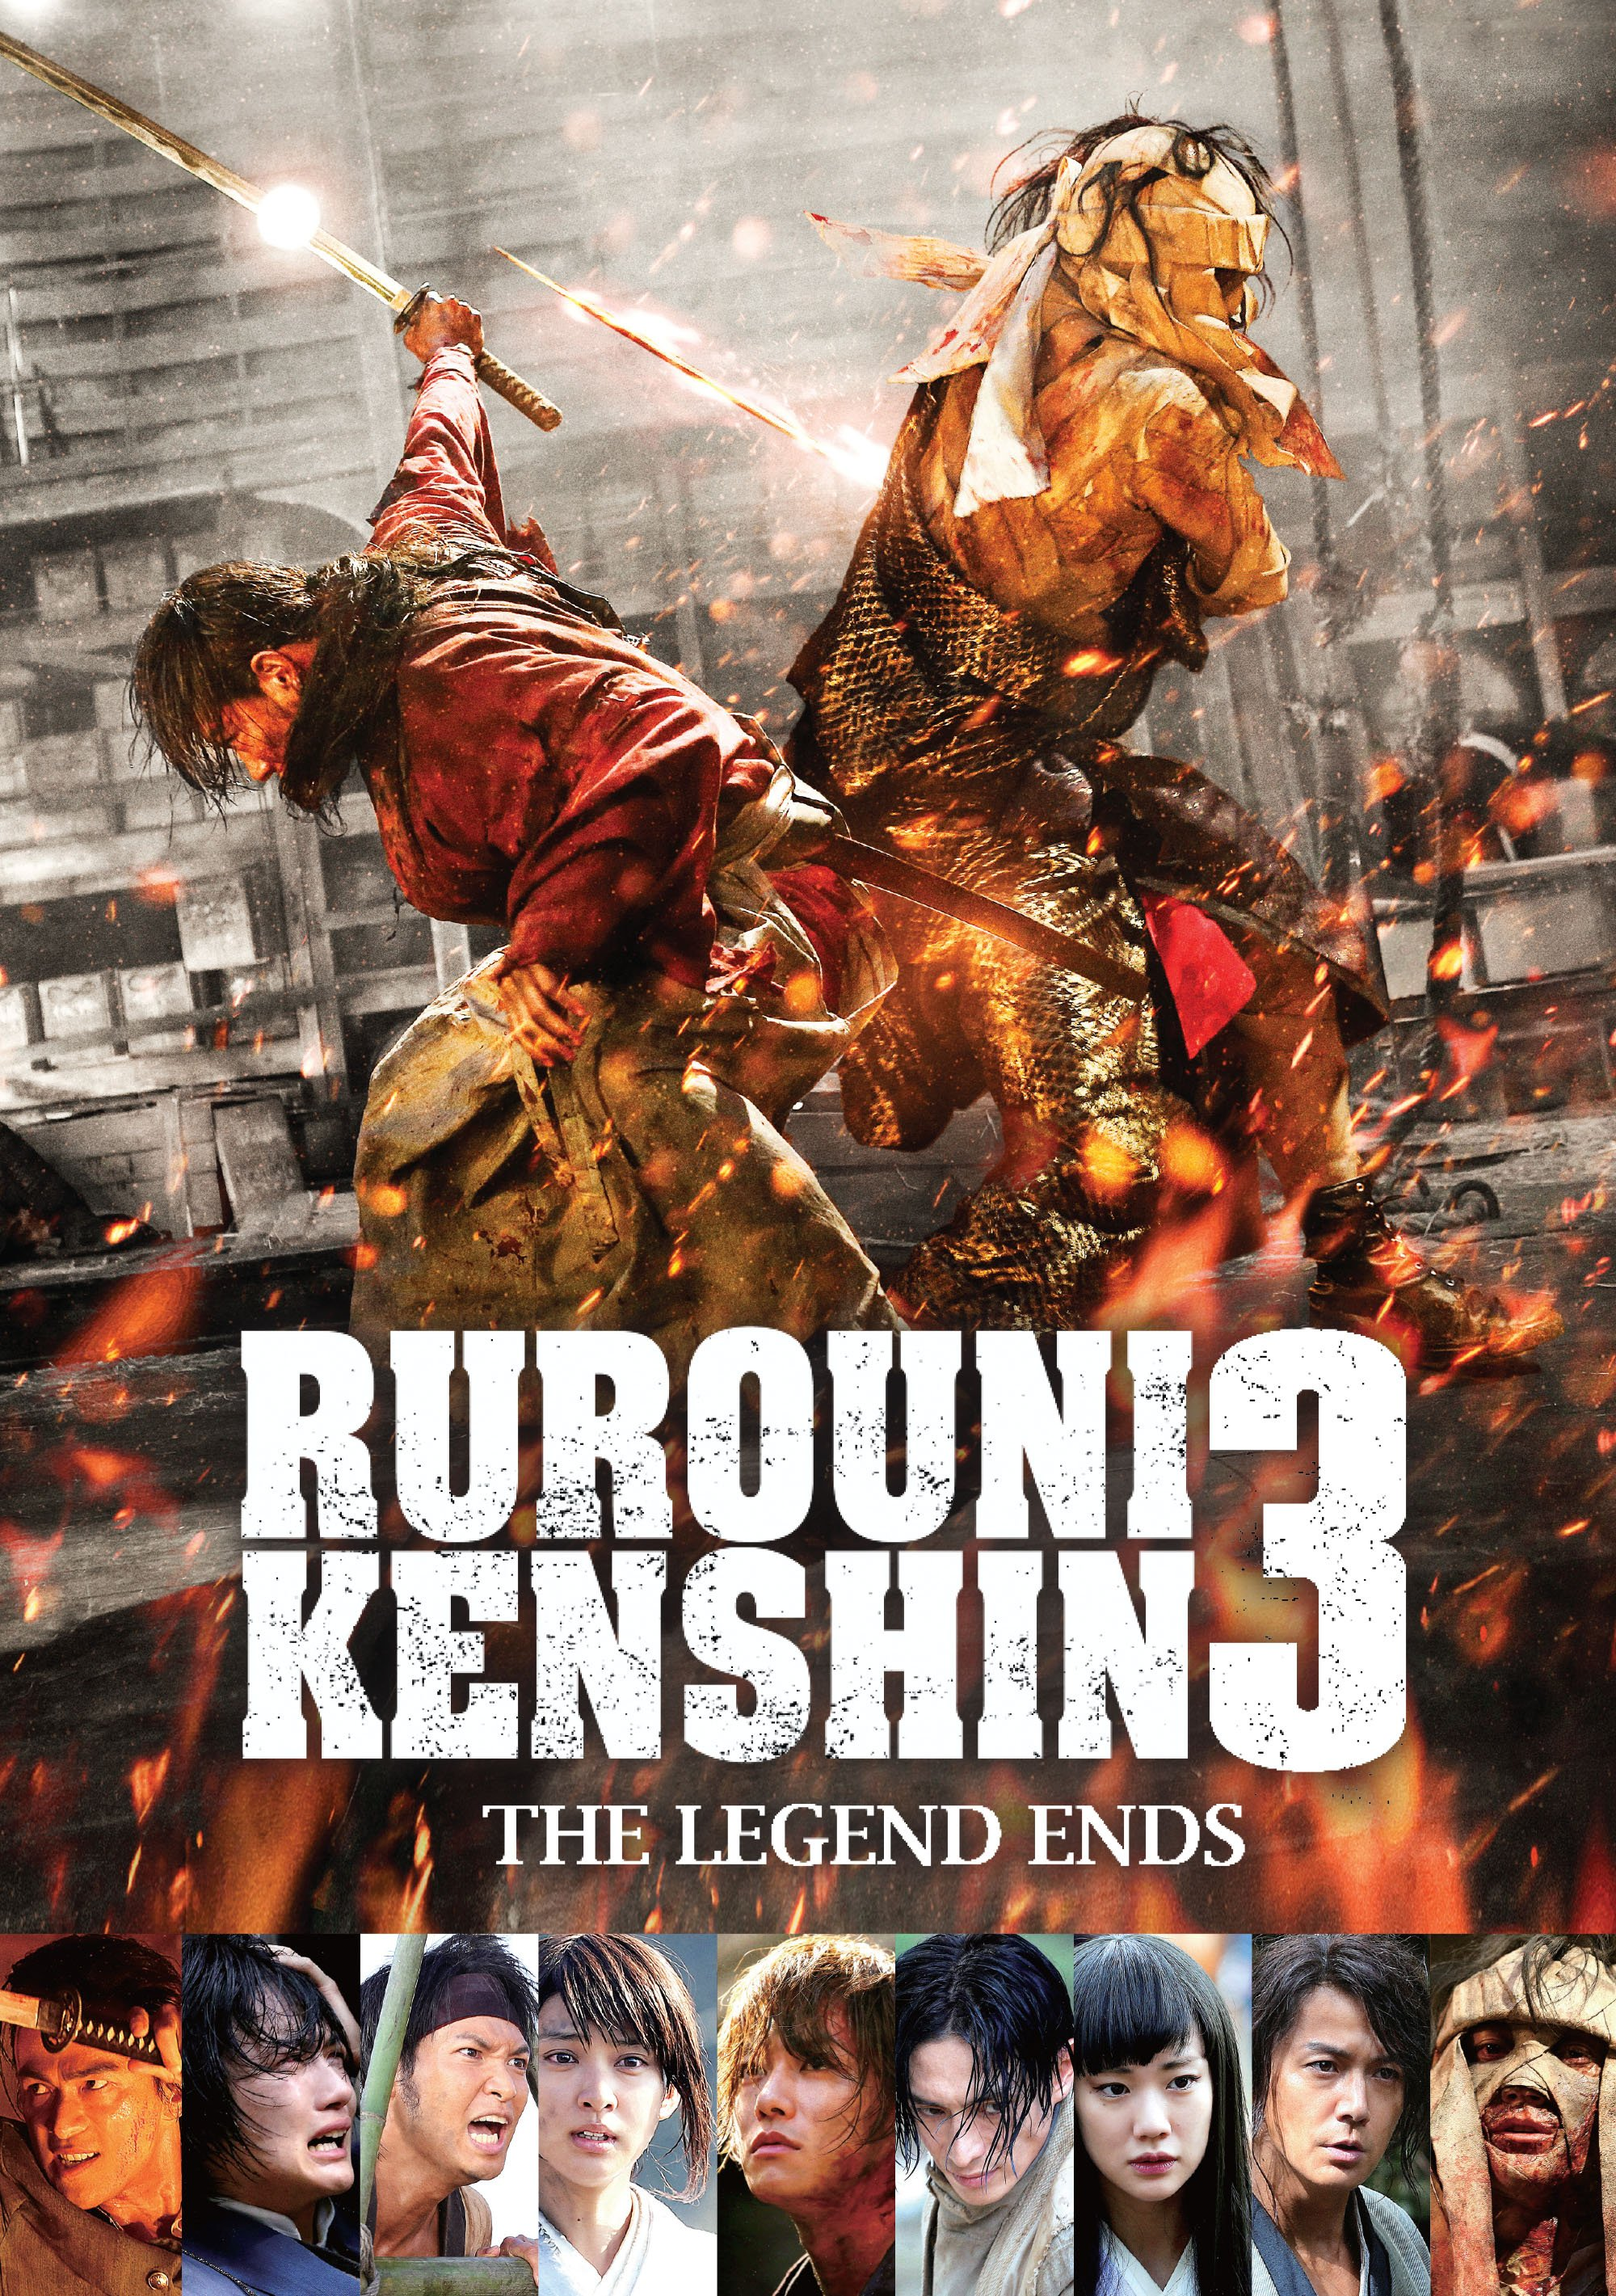 amazoncom rurouni kenshin trilogy bluray rurouni